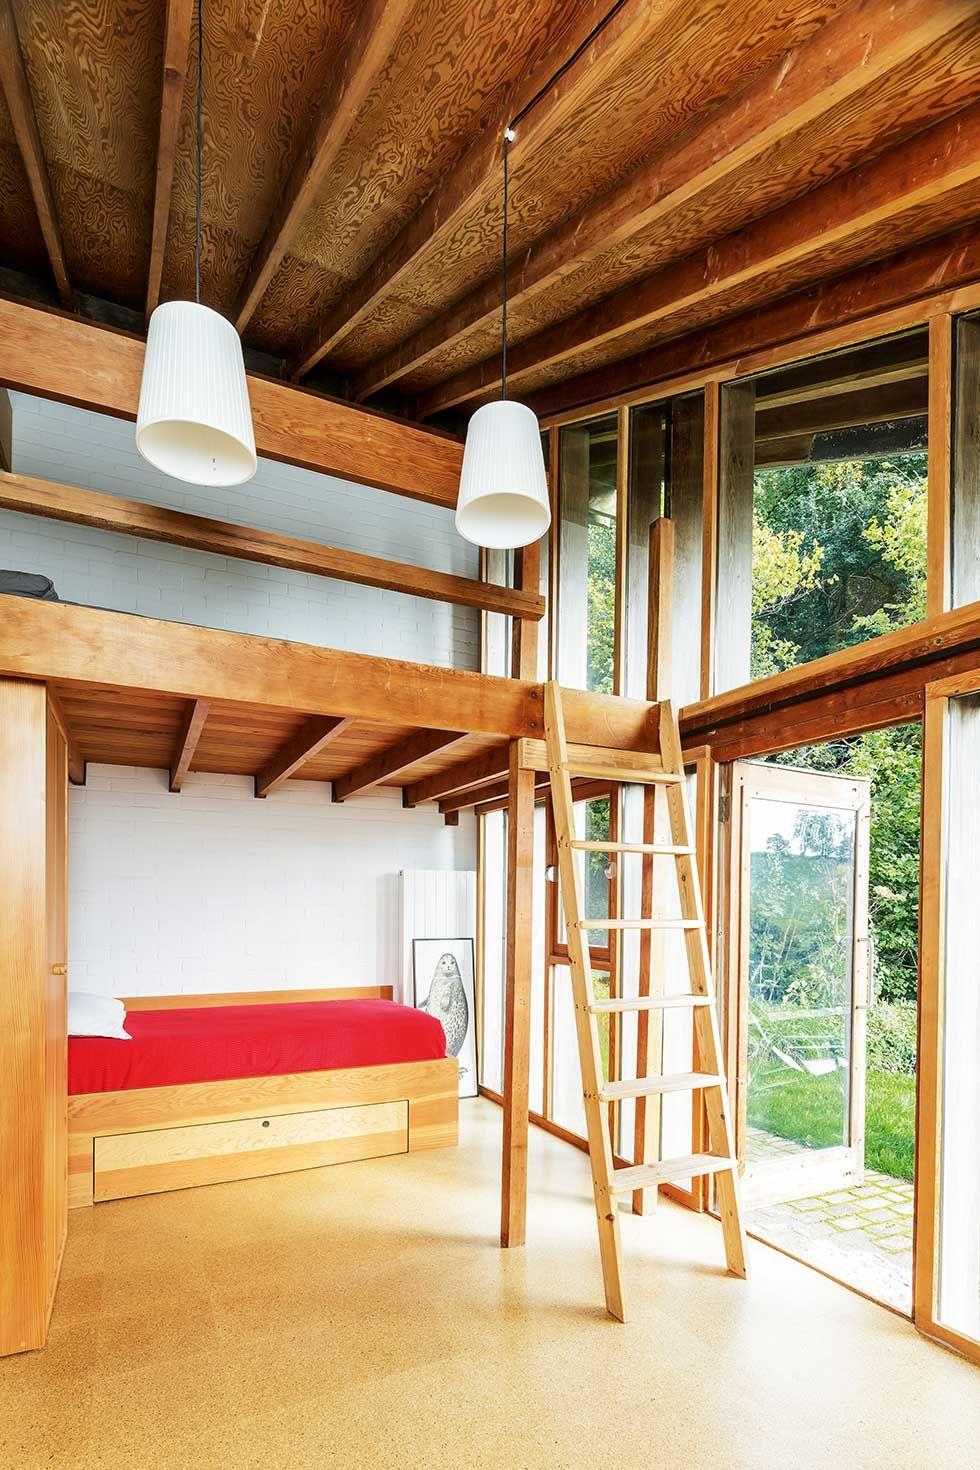 Homebuilding Renovating: Tiny House Loft, Building A House, Floor Renovation